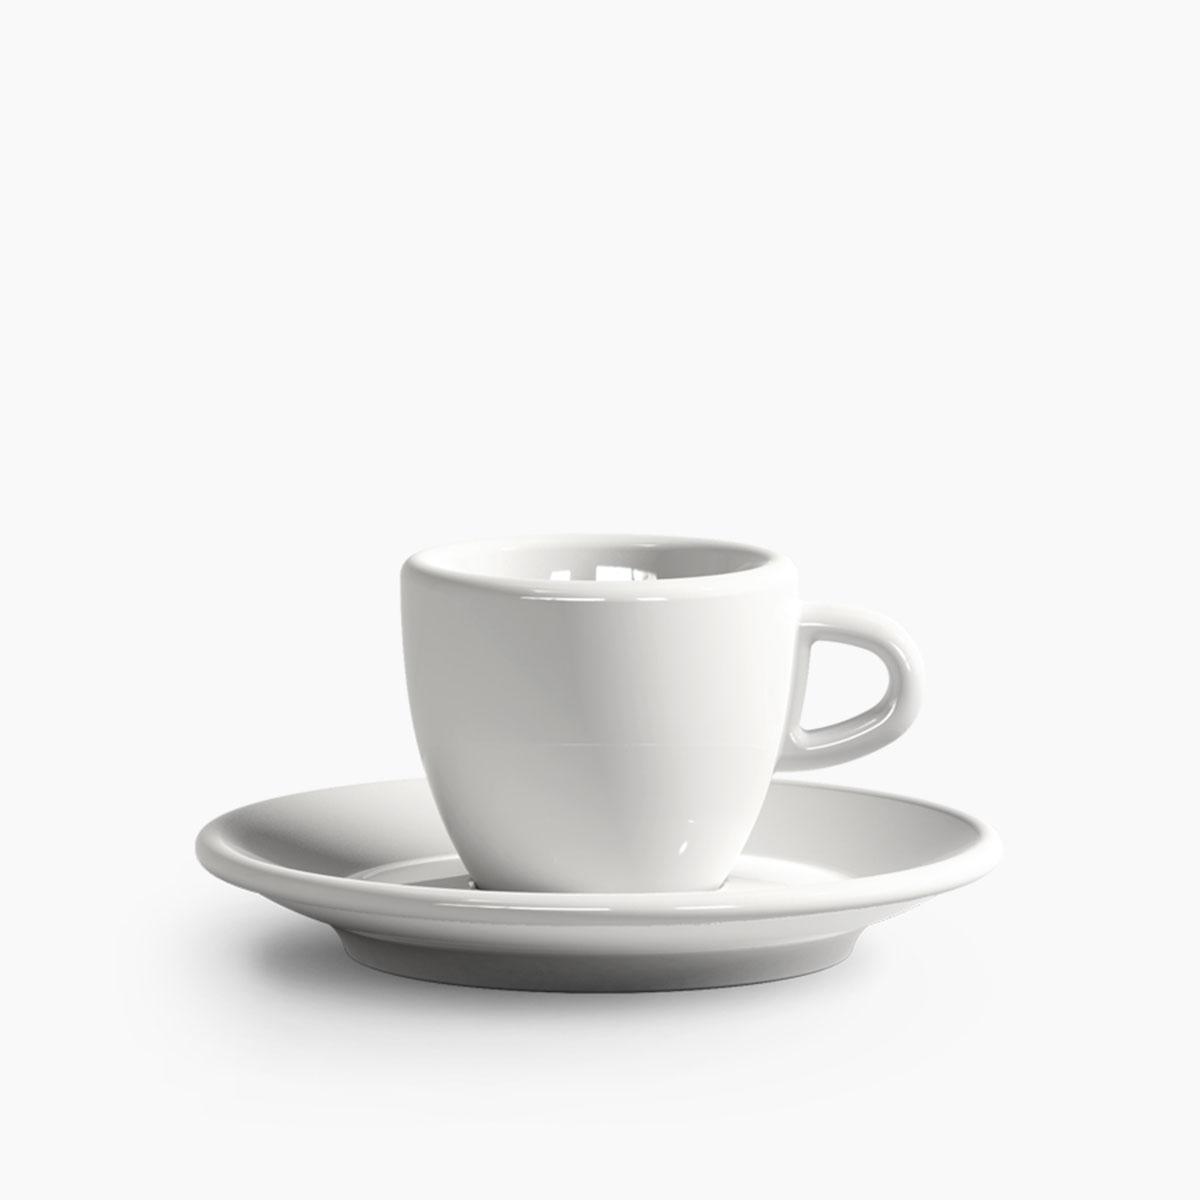 VIOLA COFFEE BIANCO 70ml